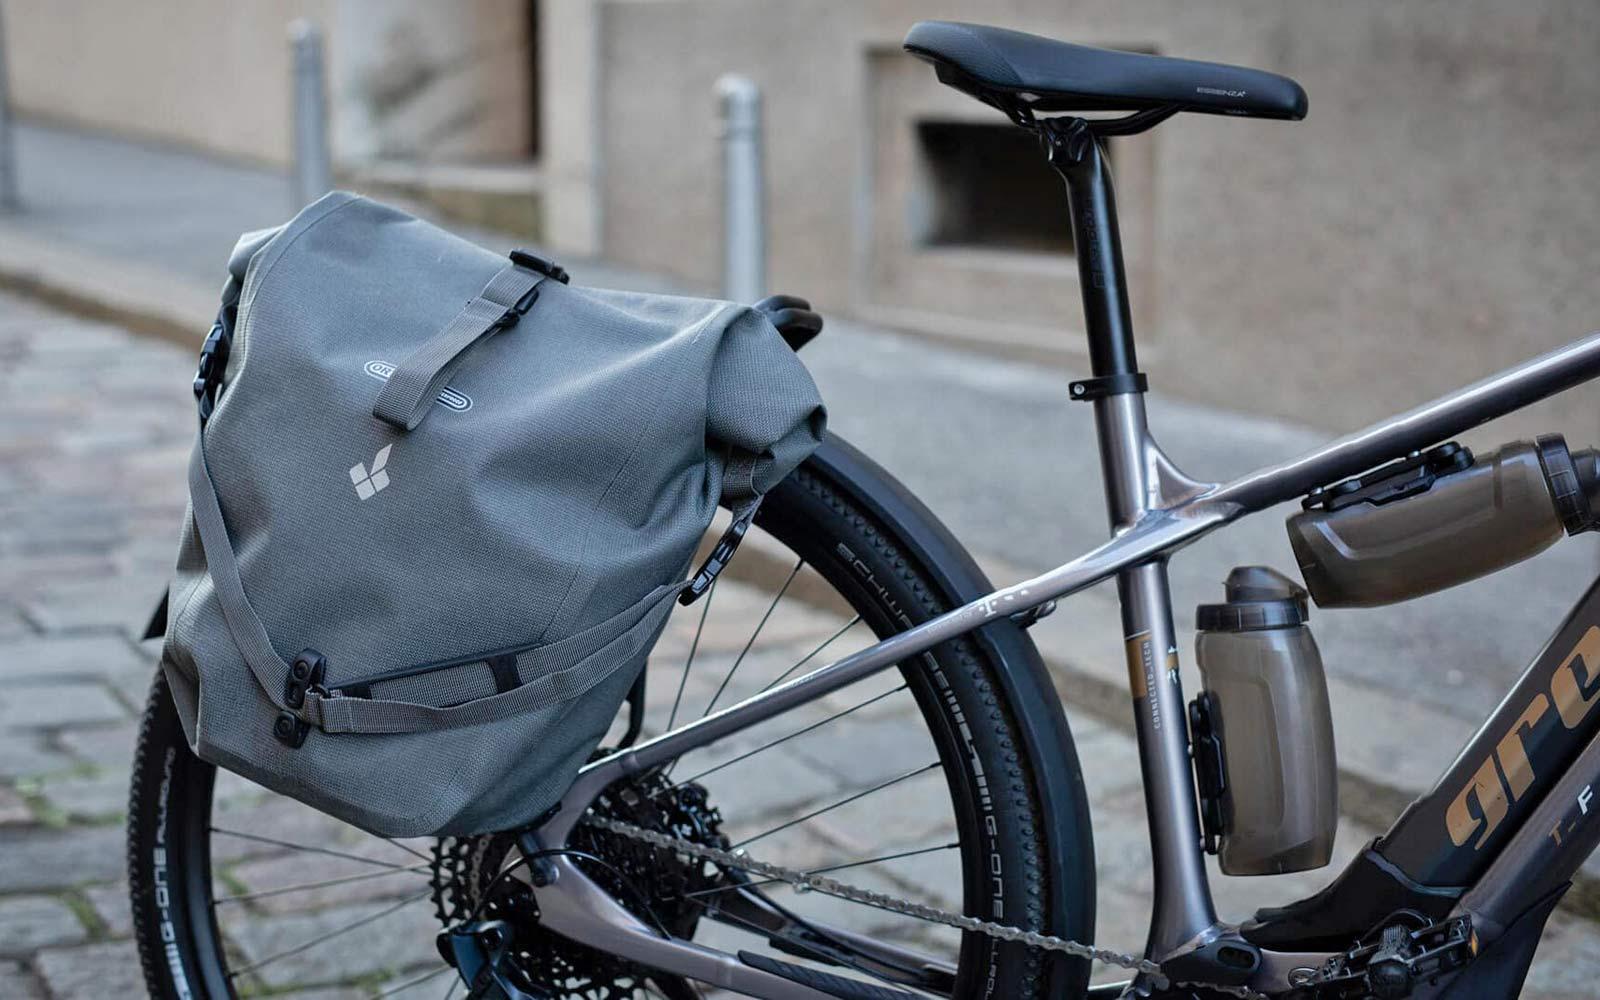 Greyp T5 alloy trekking e-bike hardtail eSUV commuter touring pannier rack bag